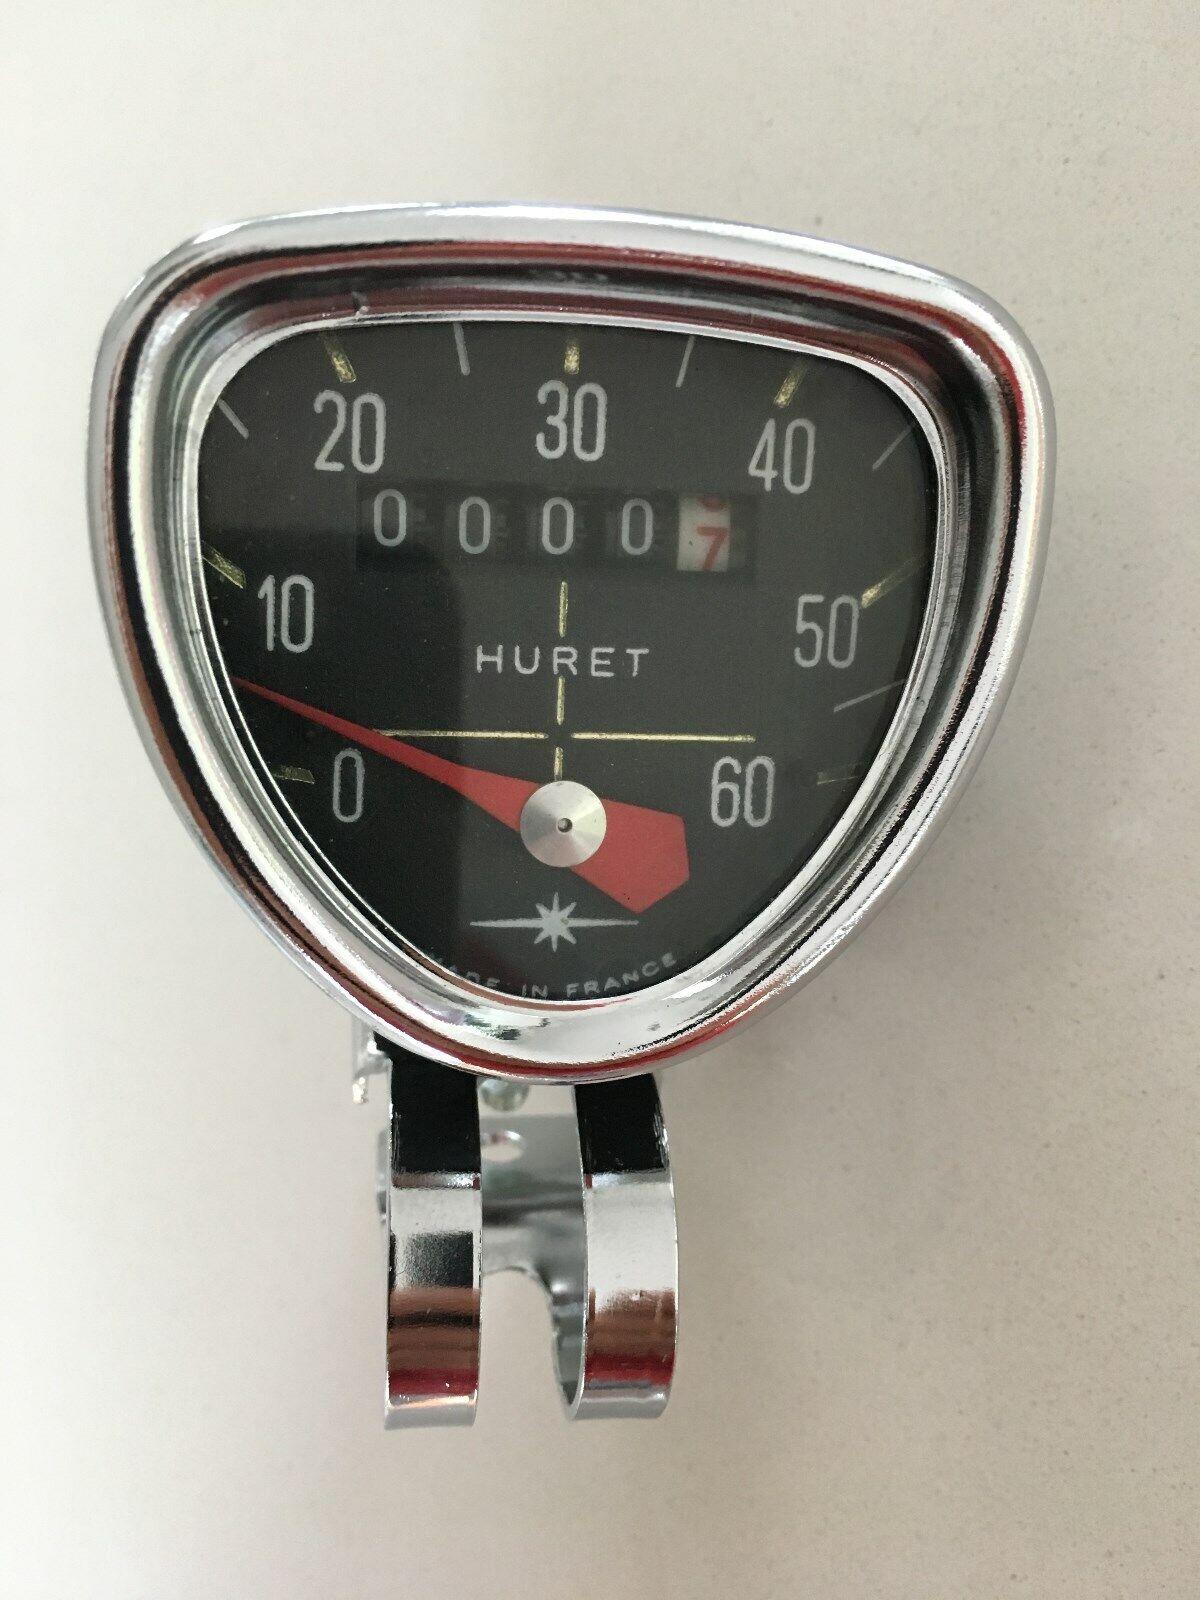 Vintage  retro Tacho  Speedometer  Huret  from the 7080ties  NOS